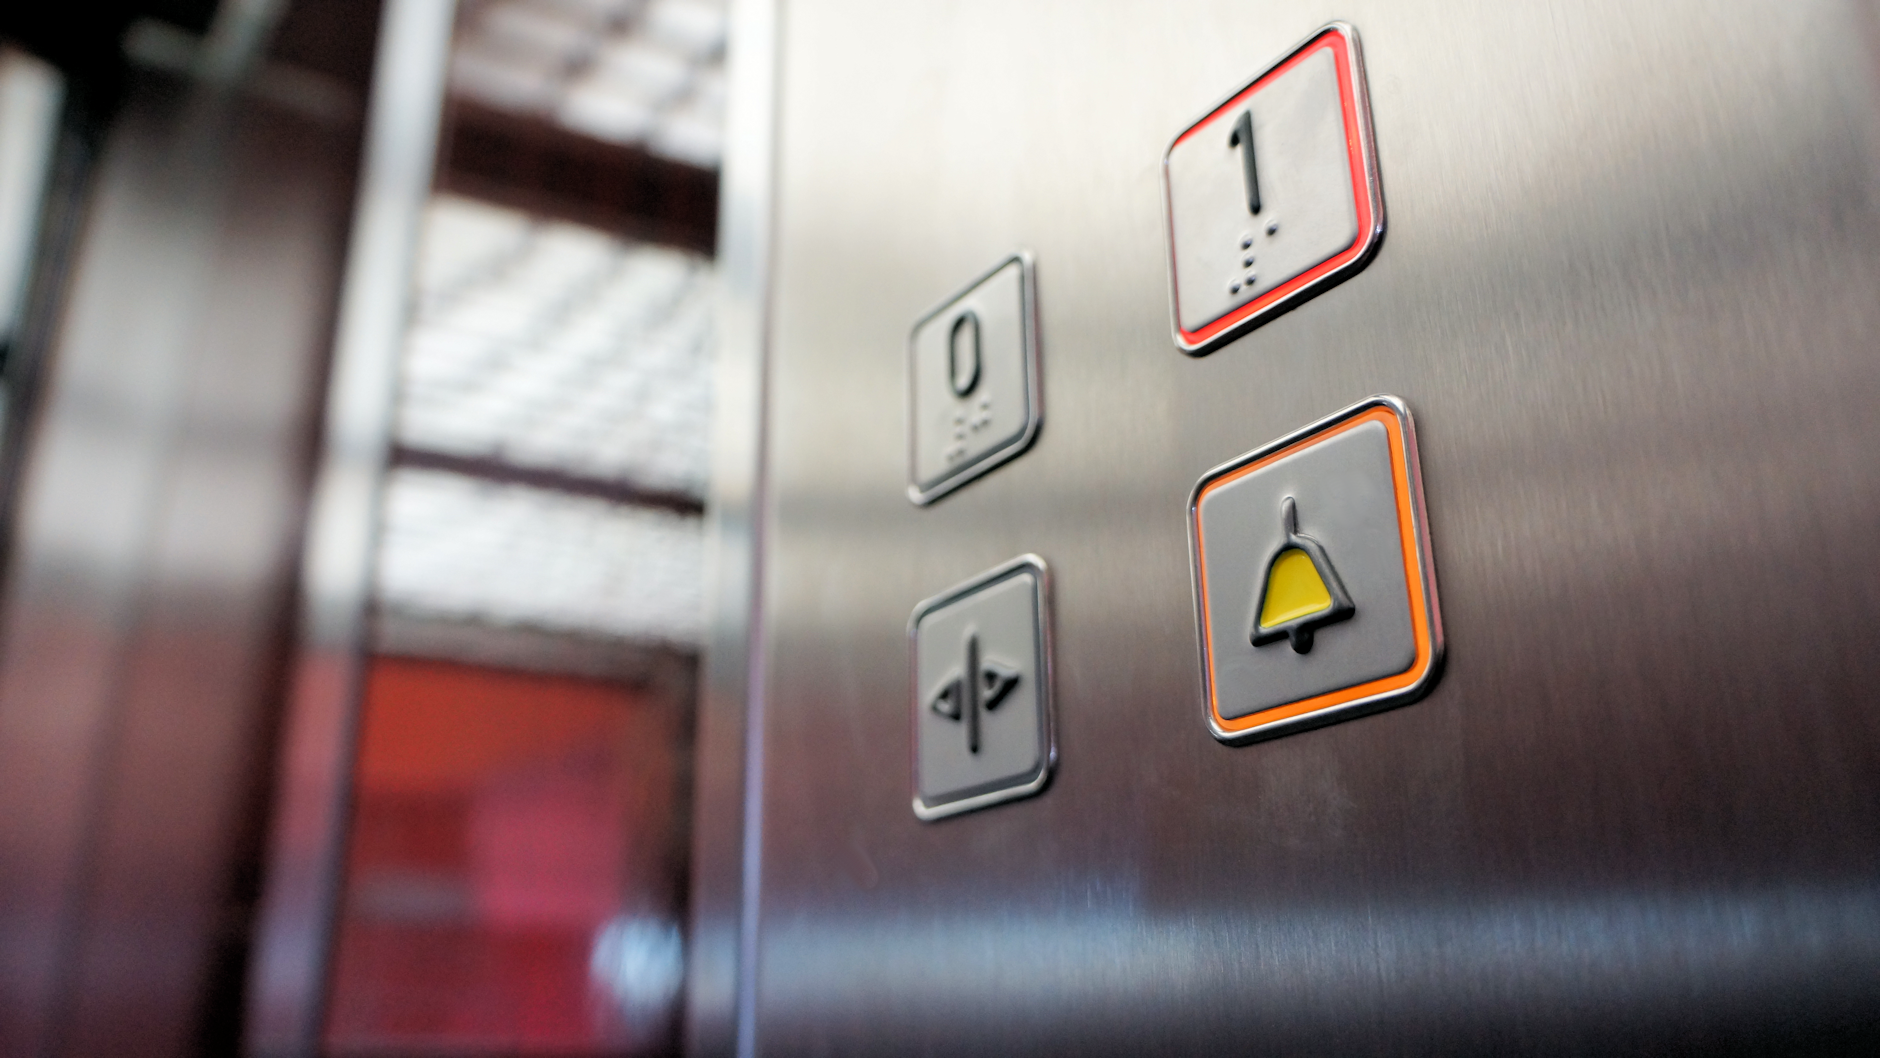 NEXTLEVEL ανελκυστήρες - ασανσερ kleemann μελετη - εγκατασταση - συντηρηση (24)